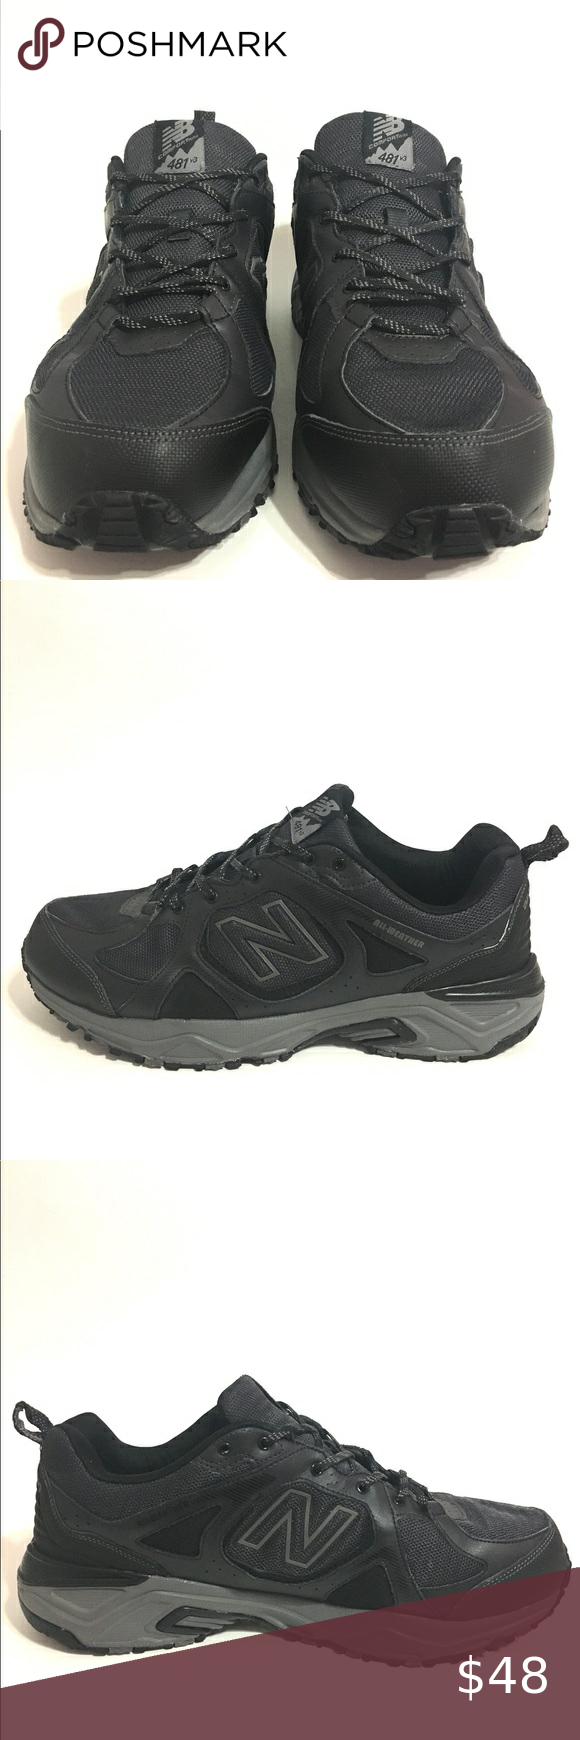 Terrain Running Shoes US Sz 14 4E